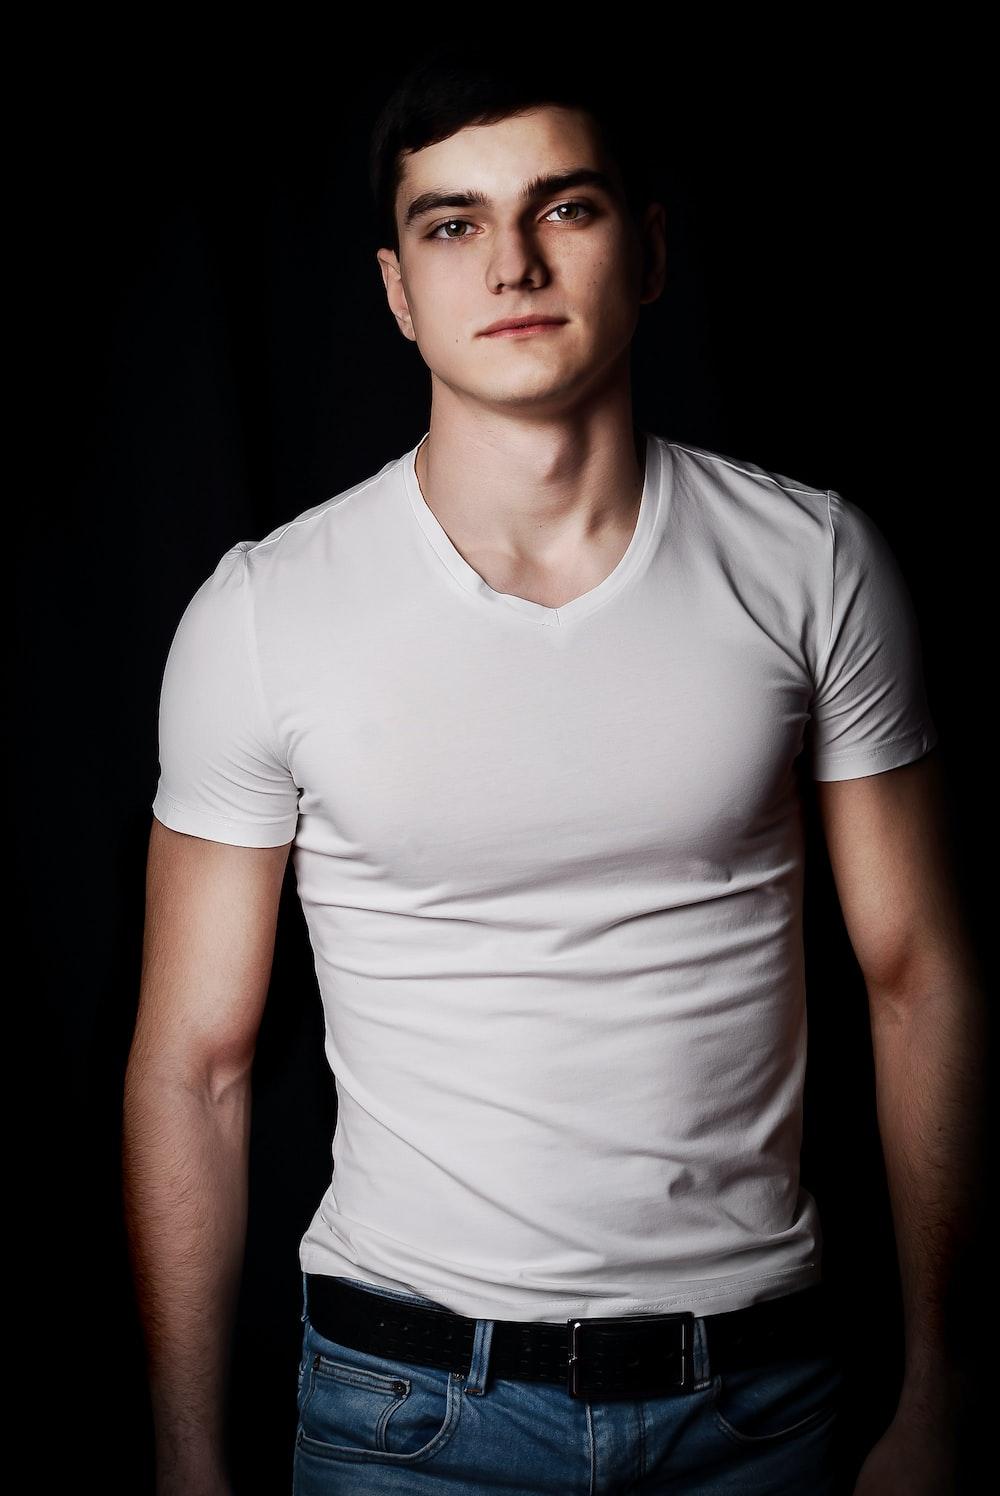 man in white V-neck t-shirt and blue denim bottoms